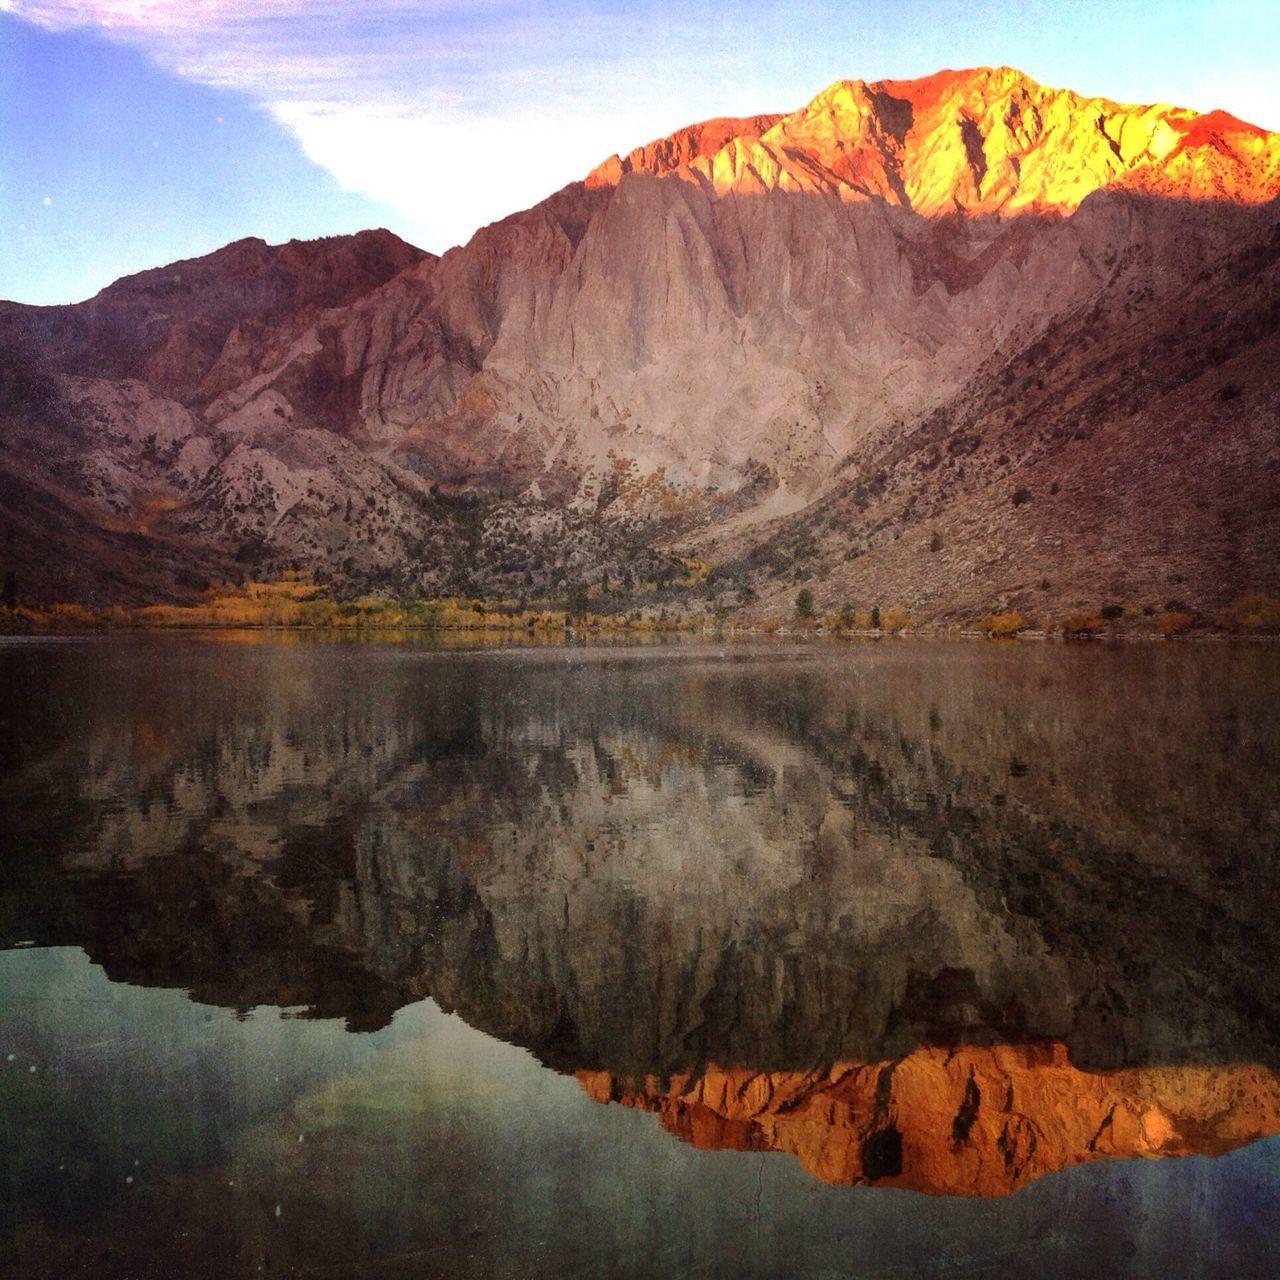 Reflection Of Mountains On Lake